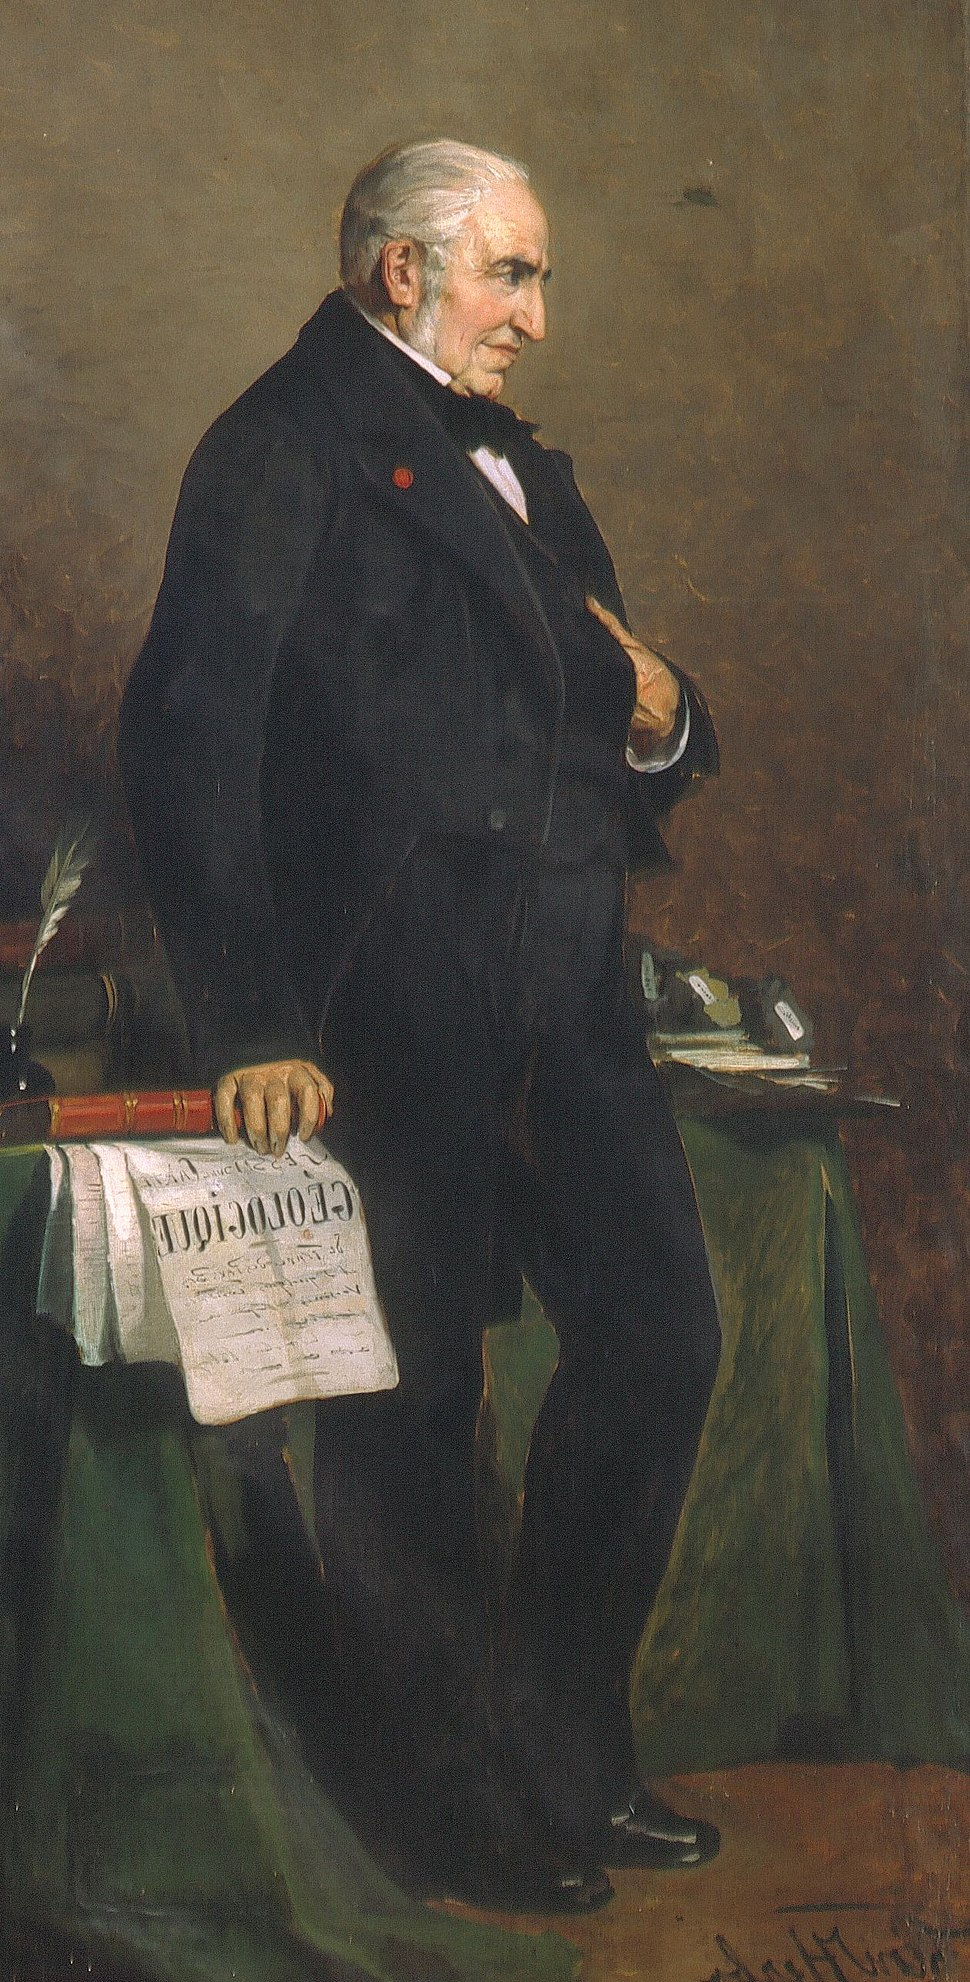 Omalius d'Halloy